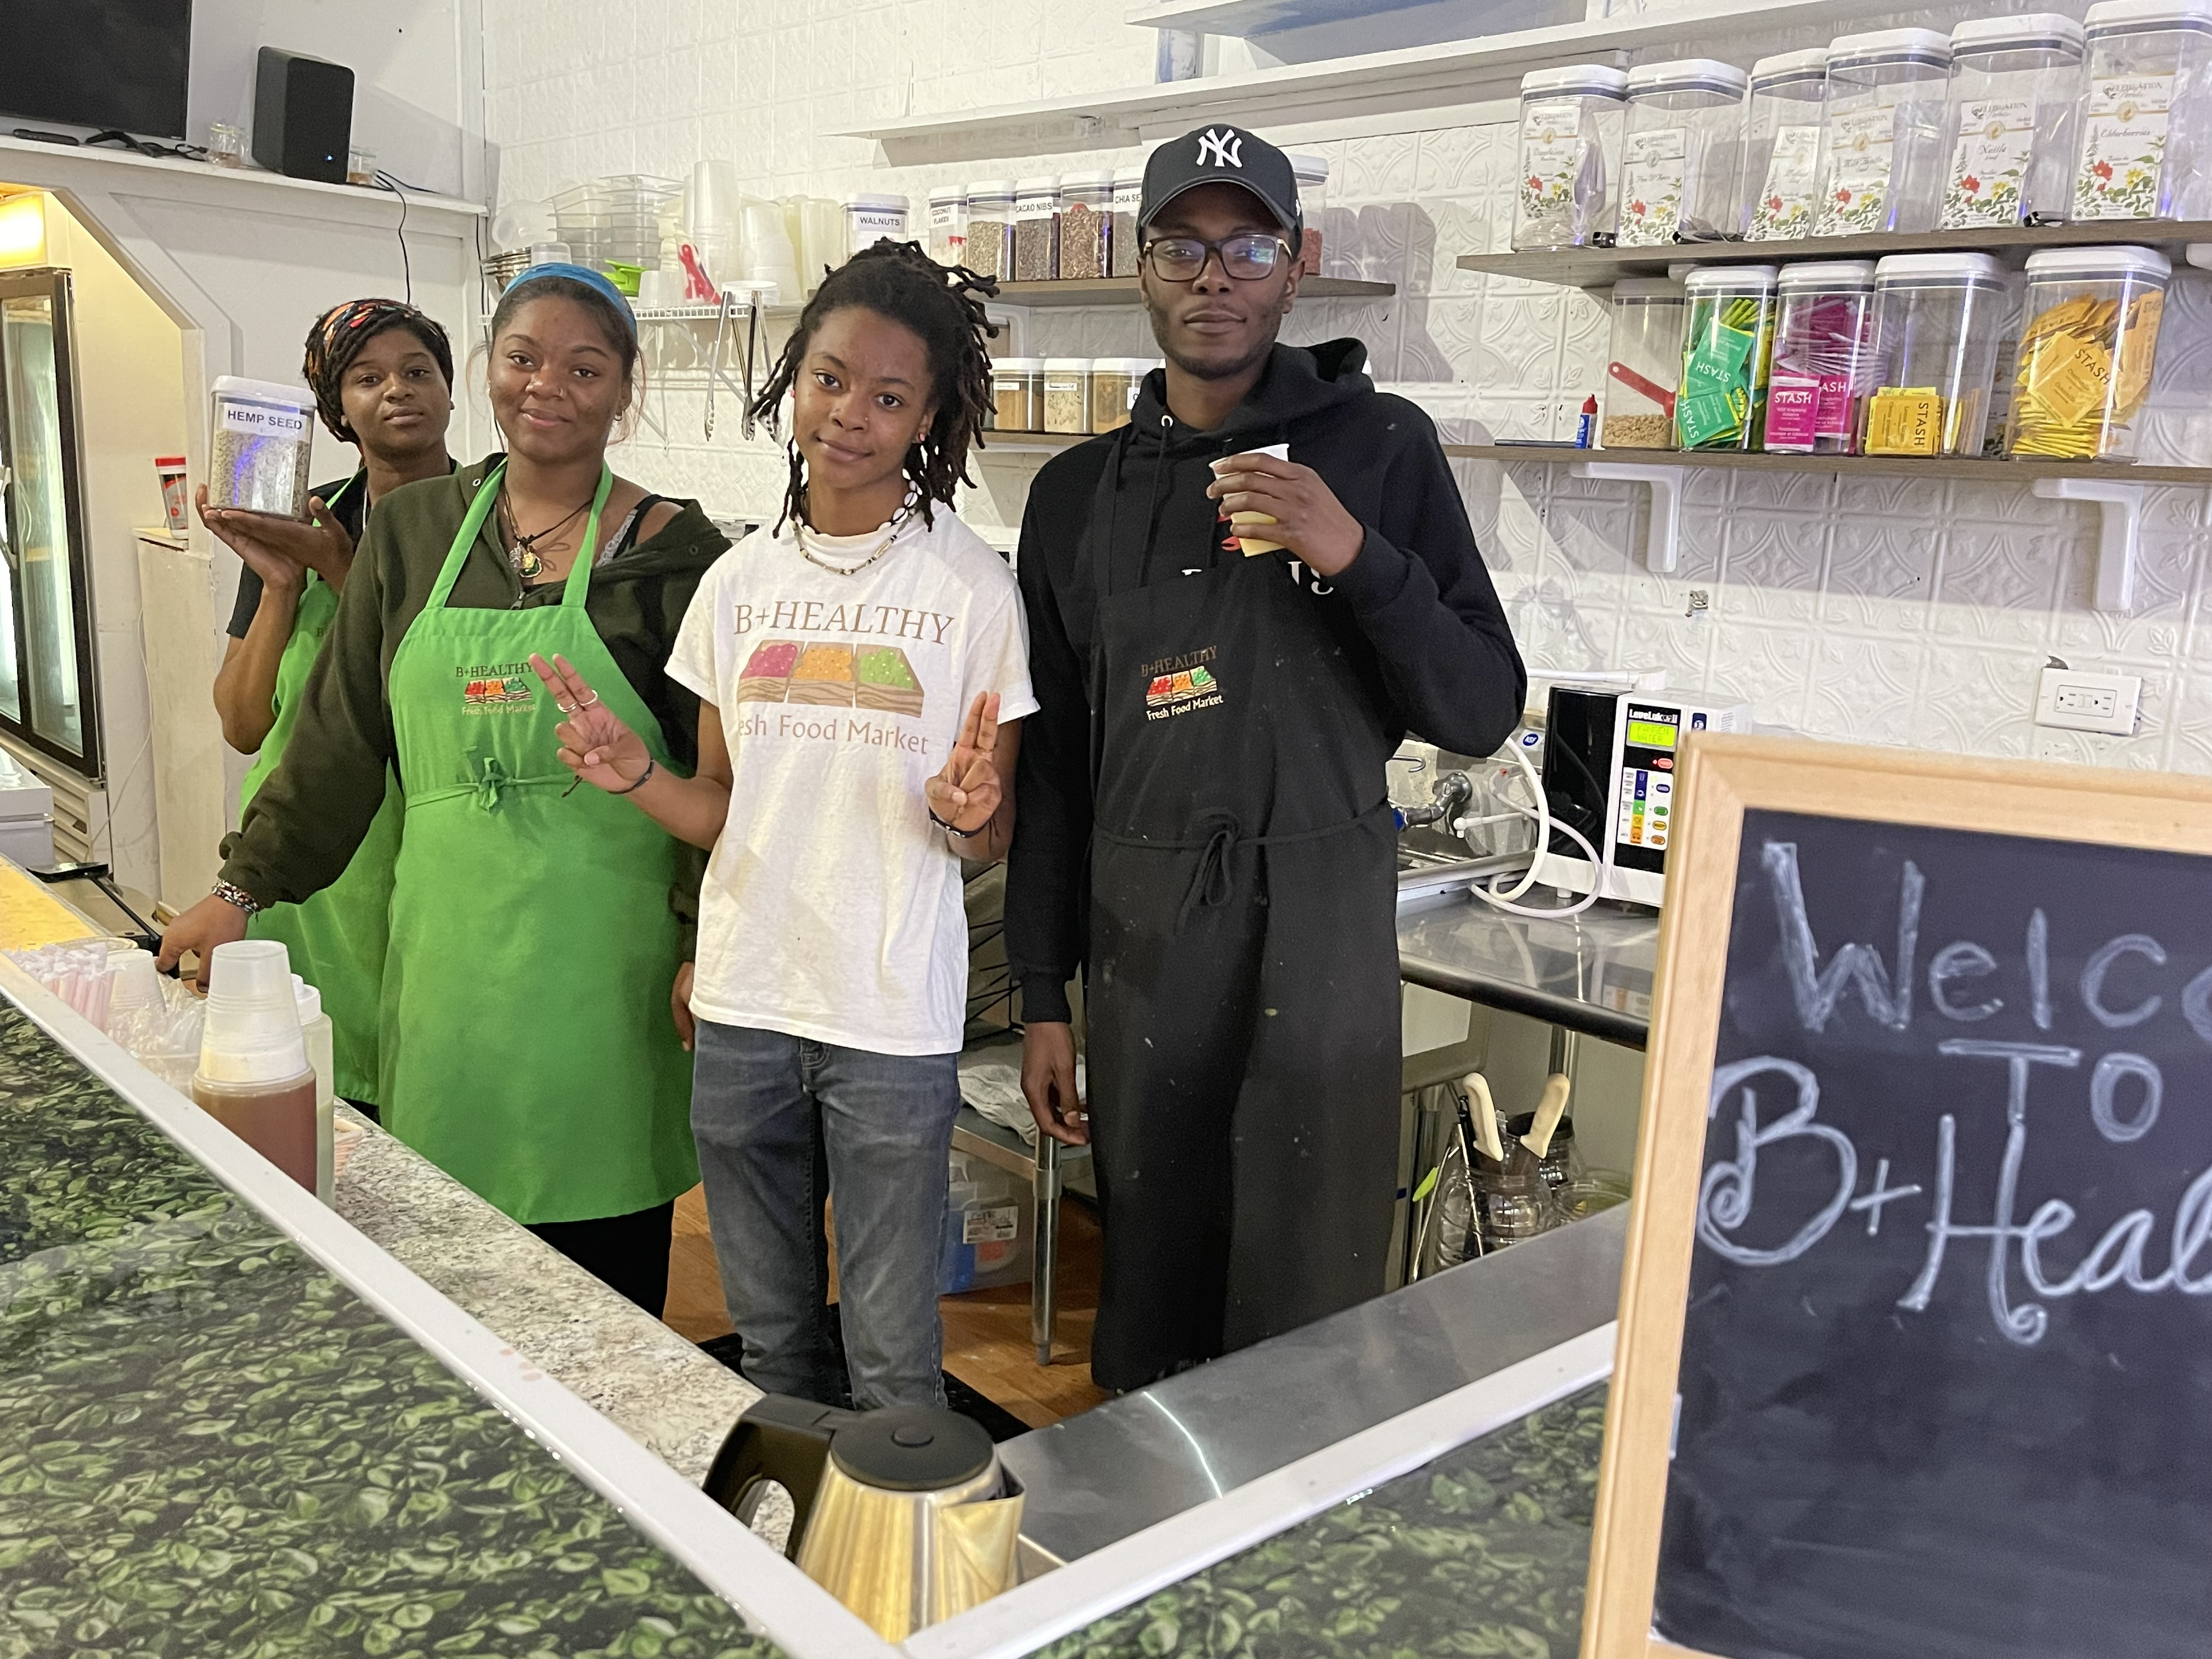 Health is Wealth at B+ Healthy Fresh Food Market